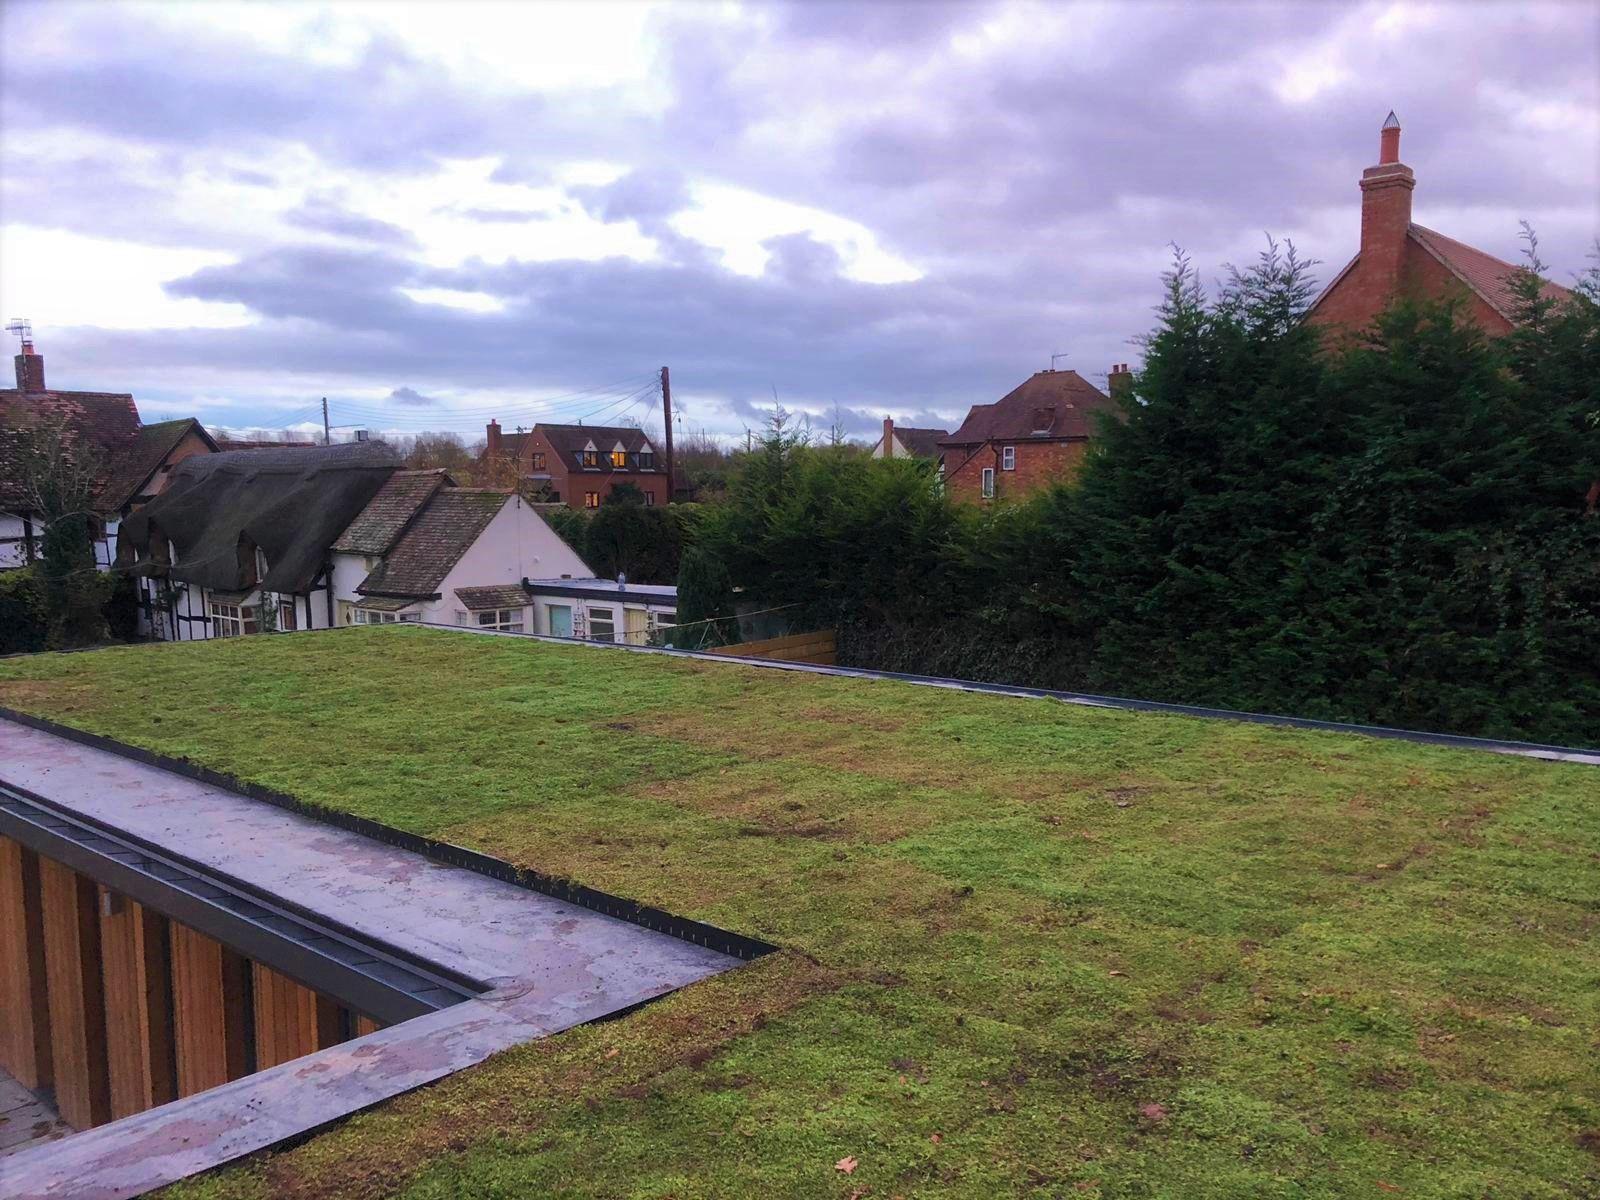 Sedum Roof Kit System By Sedum Supply Sedumroof Sedumroofkit Greenroof Greenroofsystem Roofing Livingroofs Green Roof System Sedum Roof Living Roofs